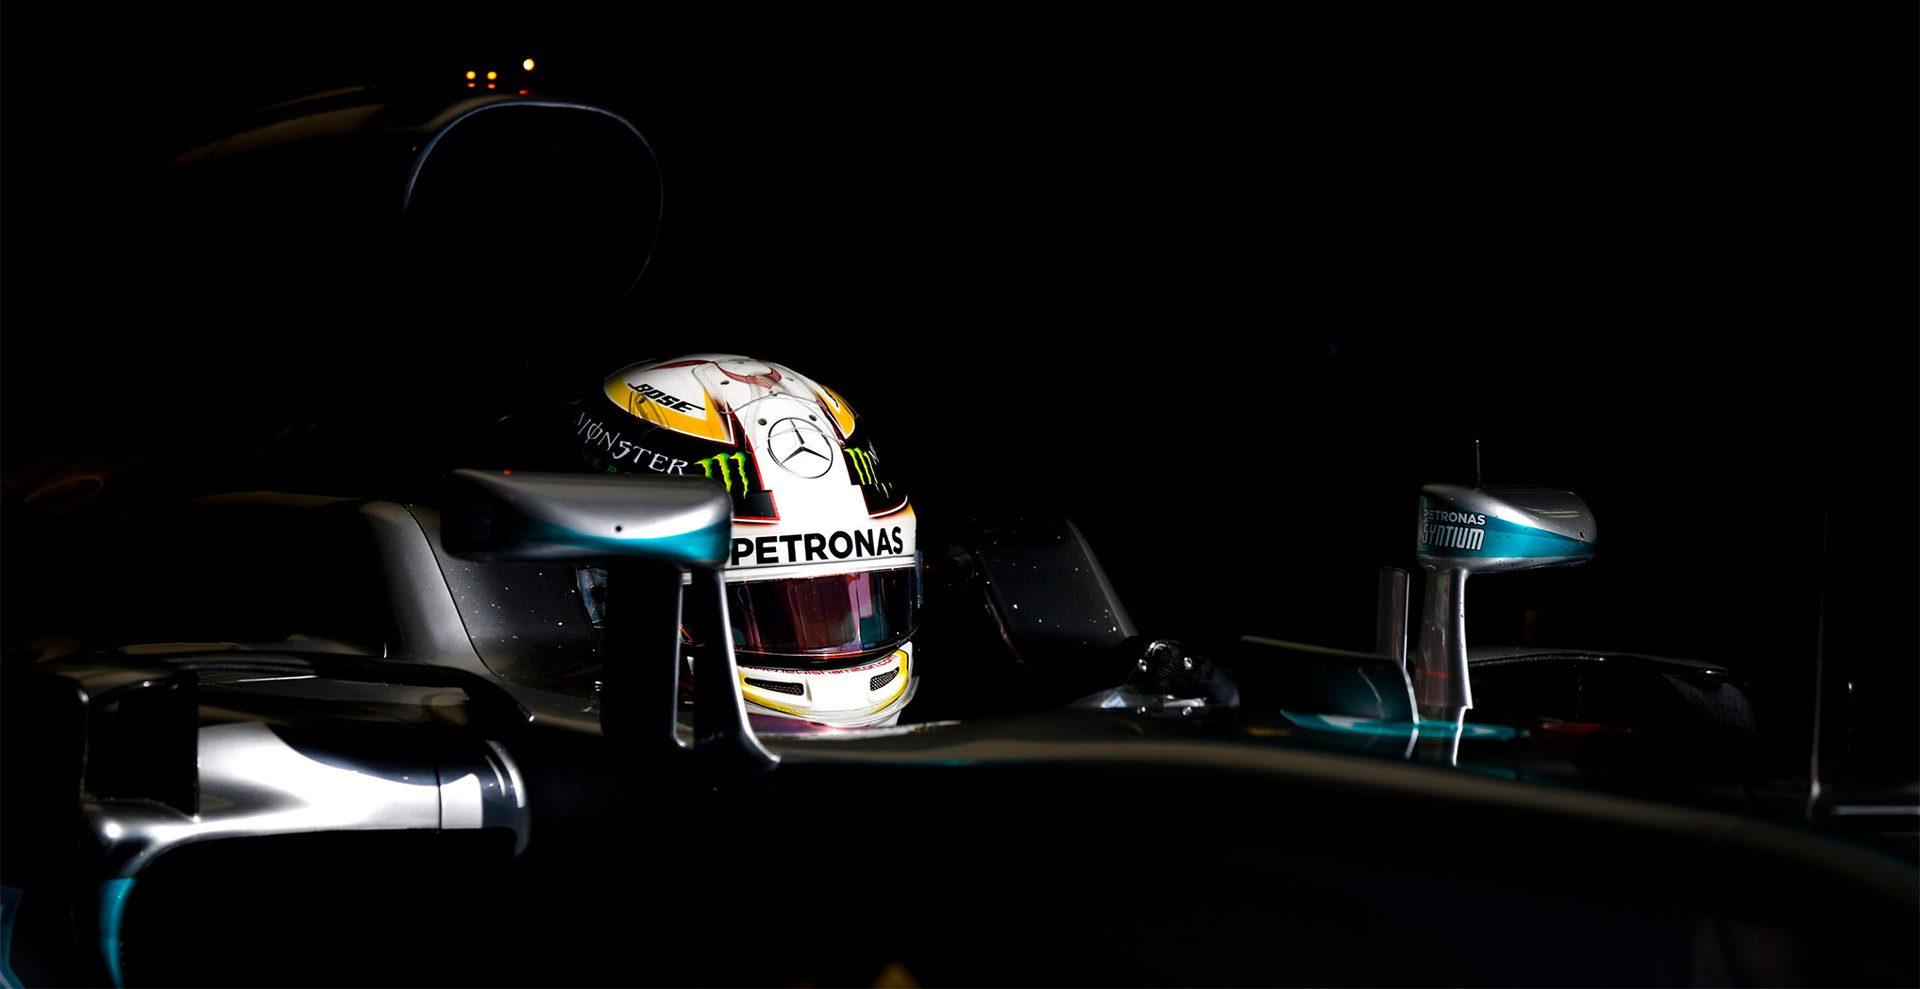 MERCEDES AMG PETRONAS Formula One Team helmet